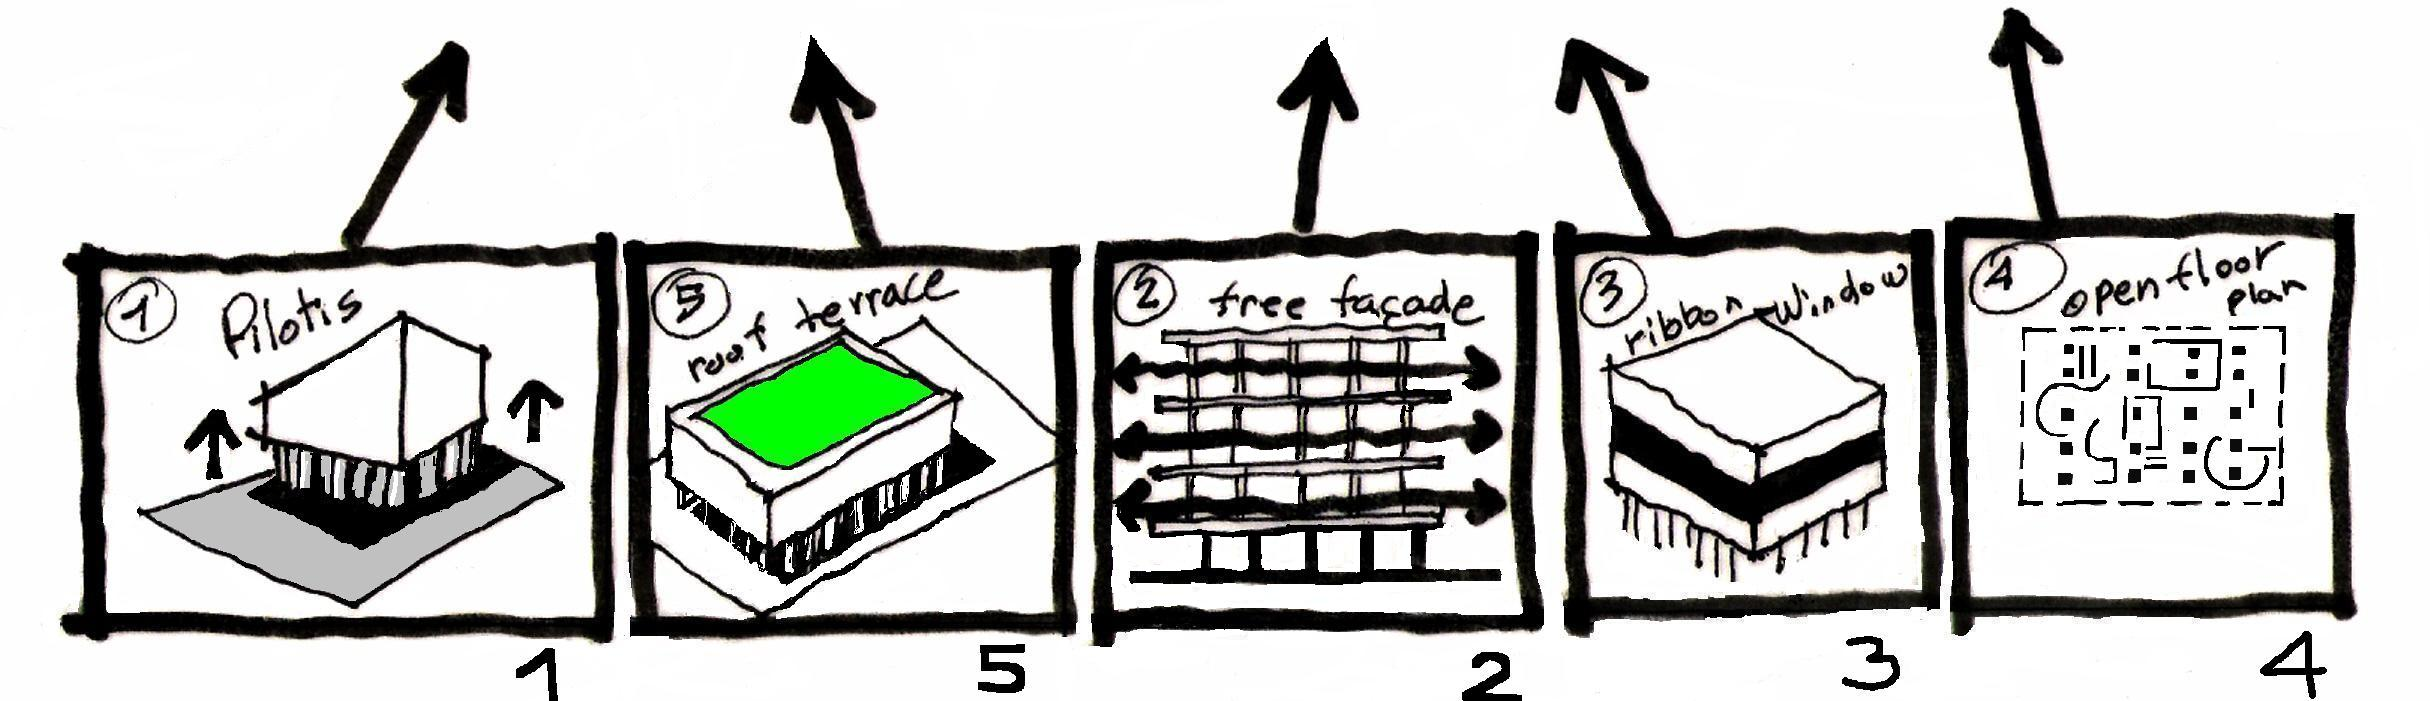 Le-corbusier-five-points-of-architecture eliinbar sketches 2010